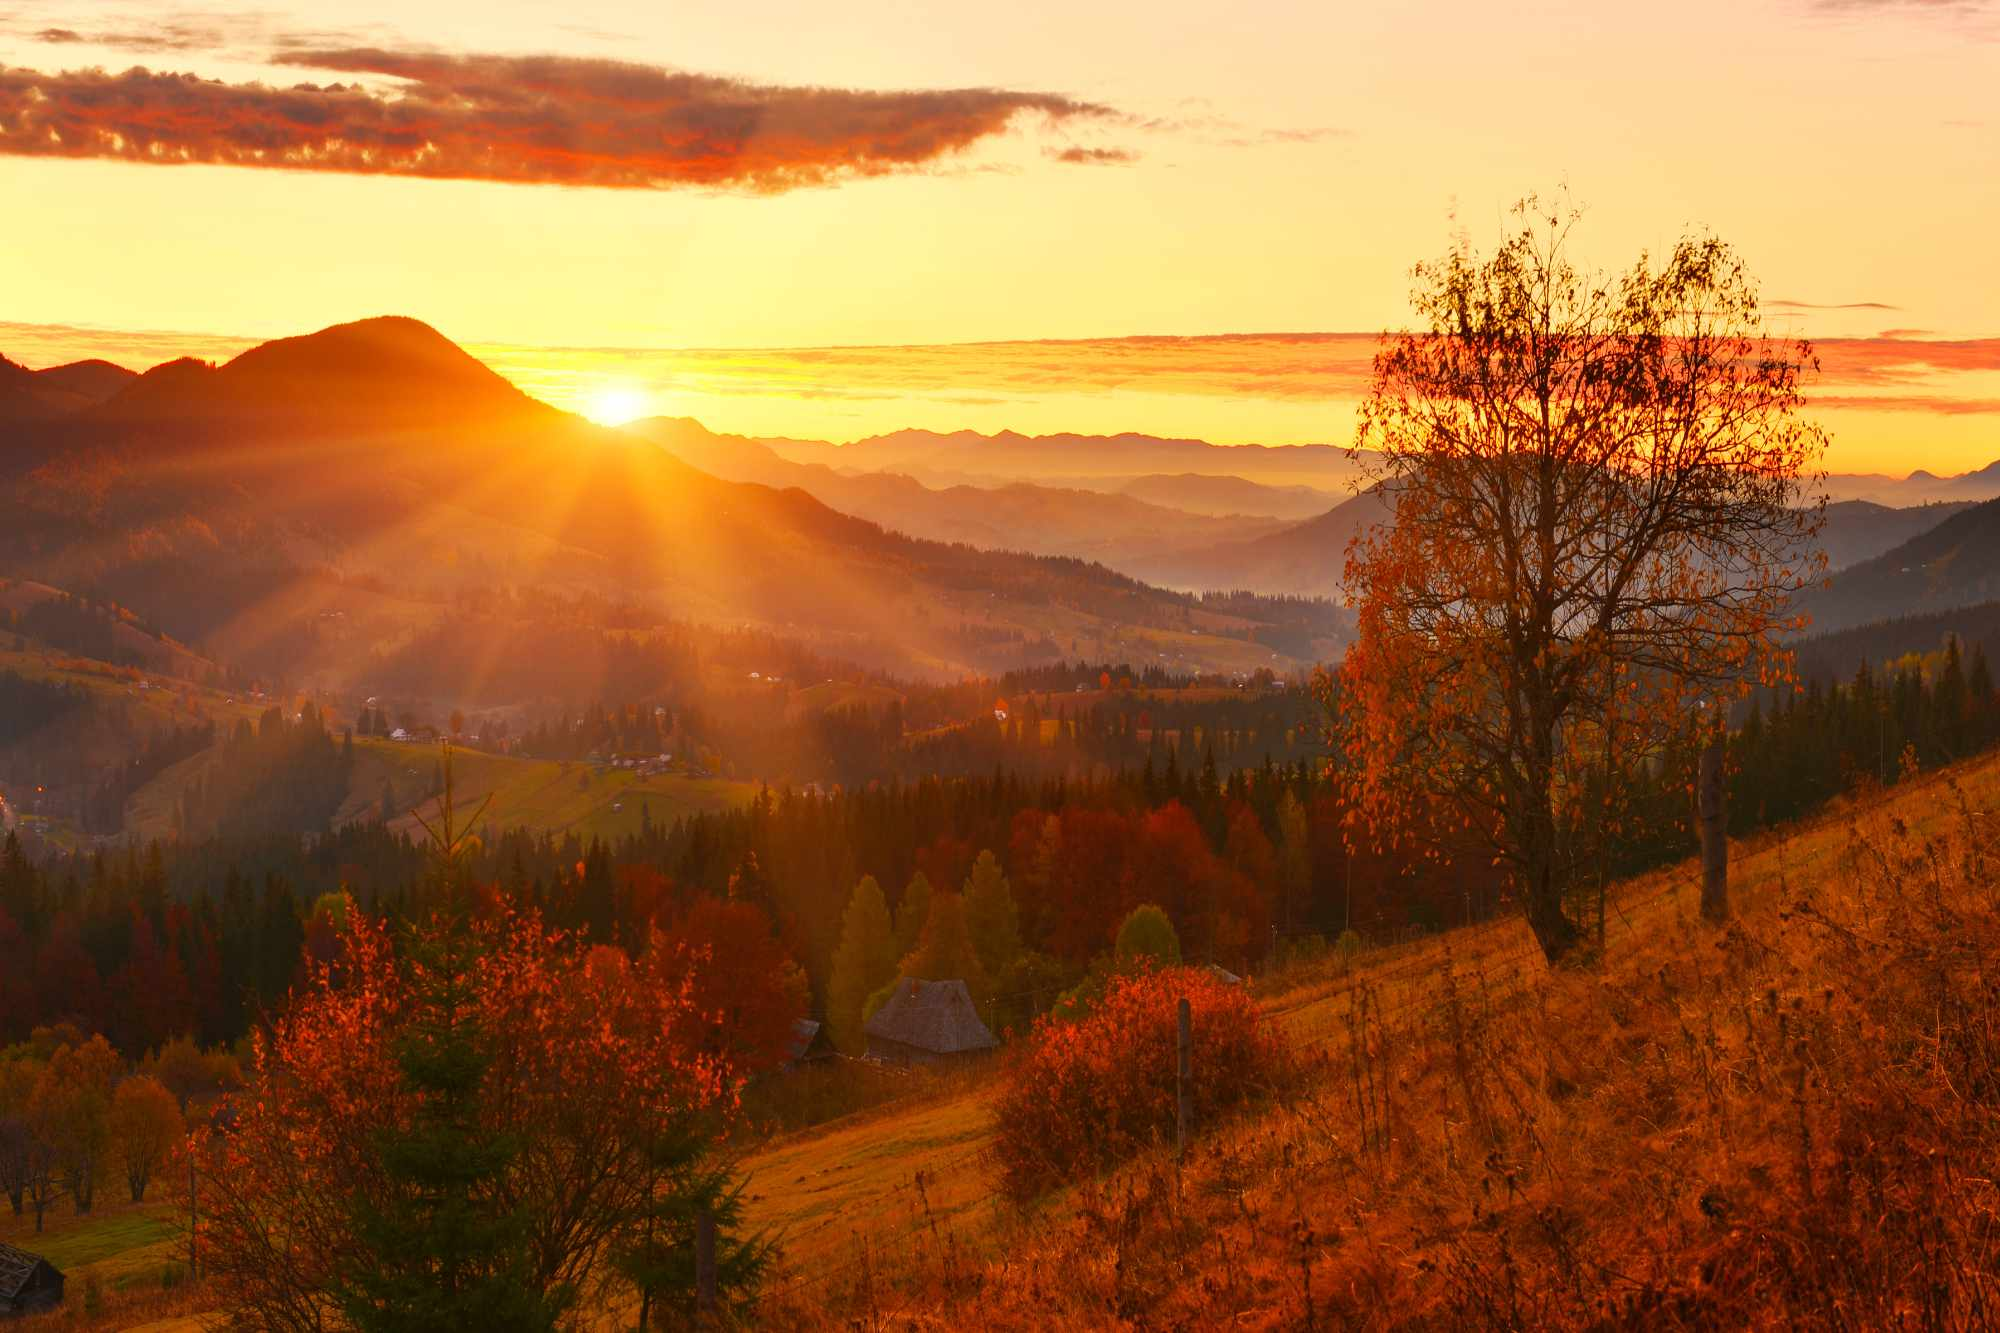 Autumn landscape in the UK